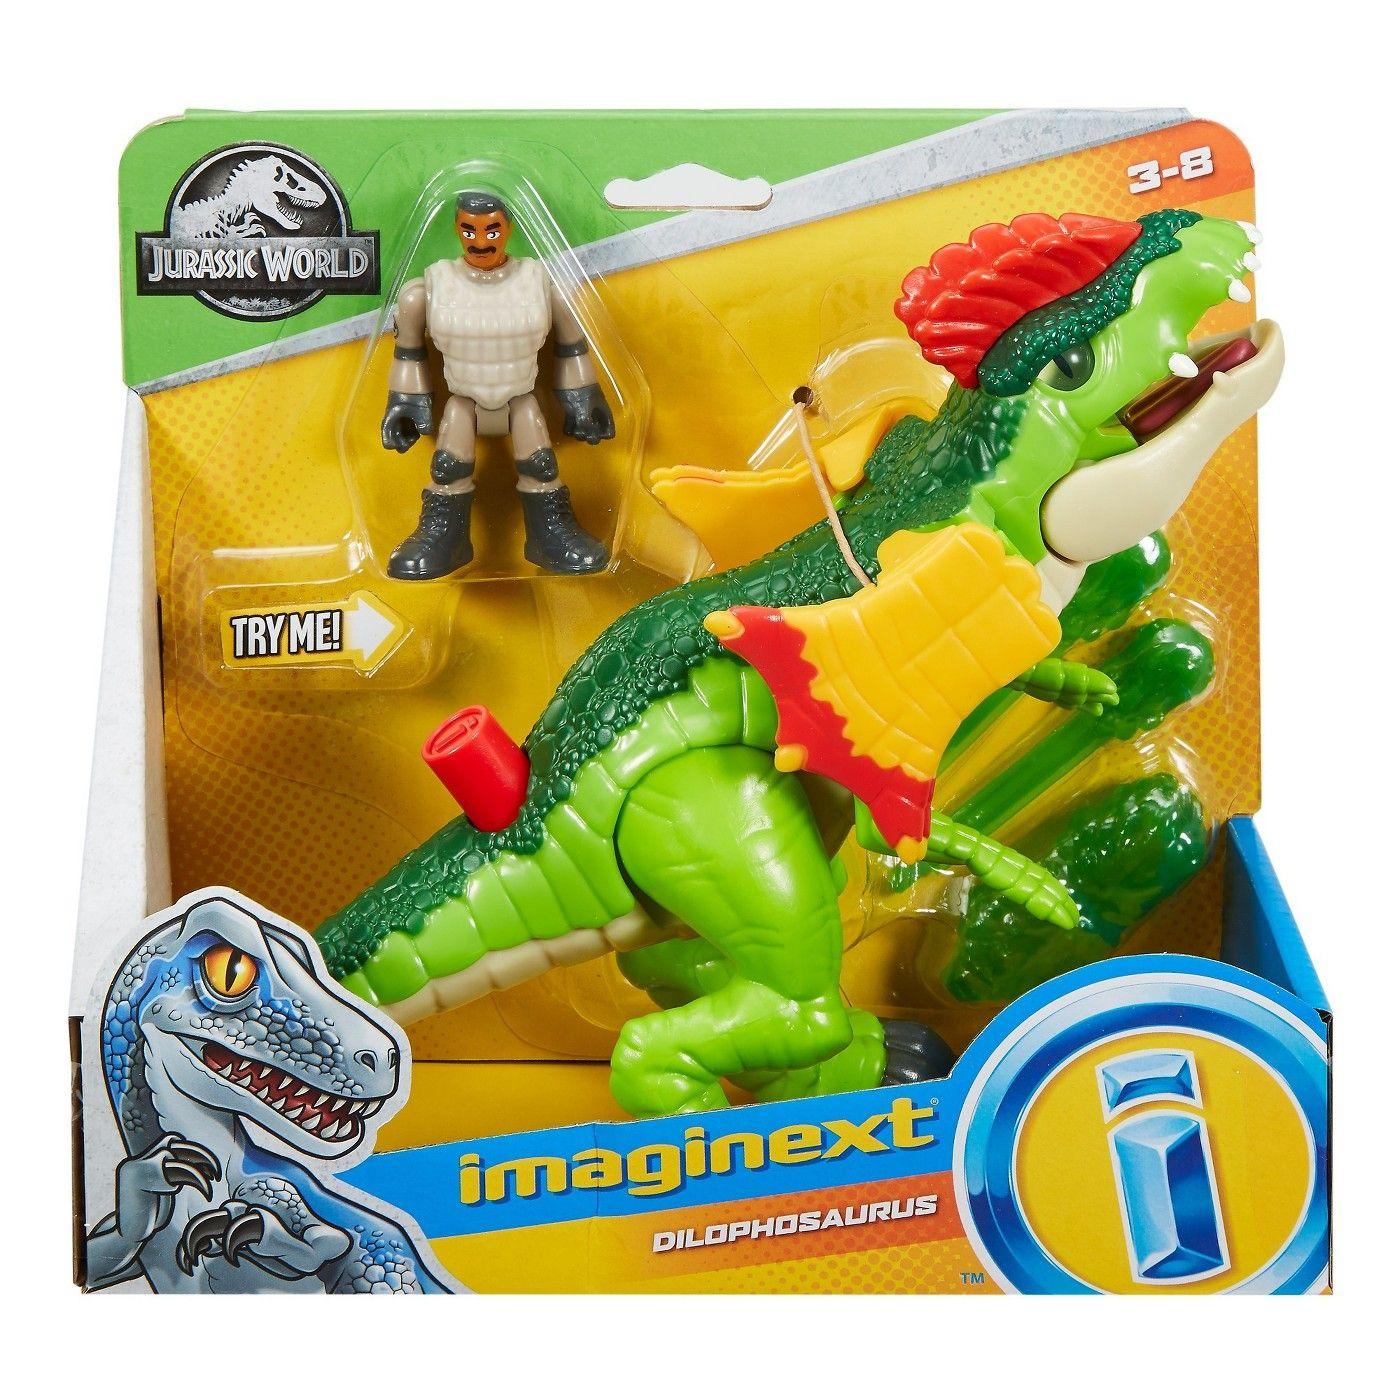 Fisher Price Jurassic World Imaginext Dilophosaurus Dinosaur /& Agent Figure NEW